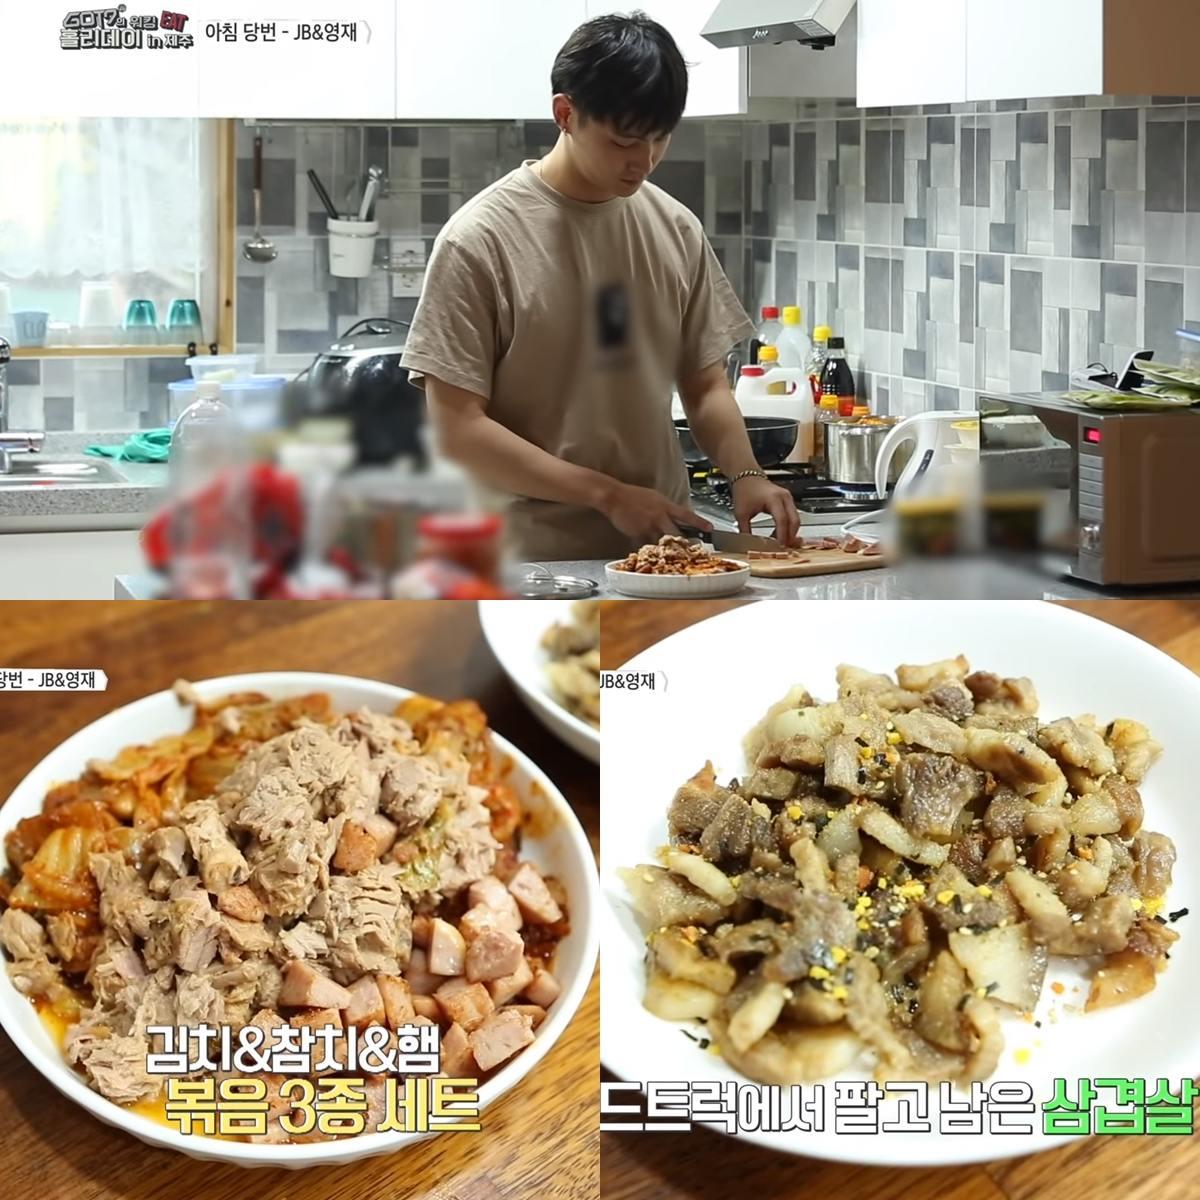 #GOT7 JB JB在GOT7節目上也曾展現廚藝過,看起來相當熟練之外,美食外觀及味道也是相當好的JB也被大讚可以開餐廳了呢!